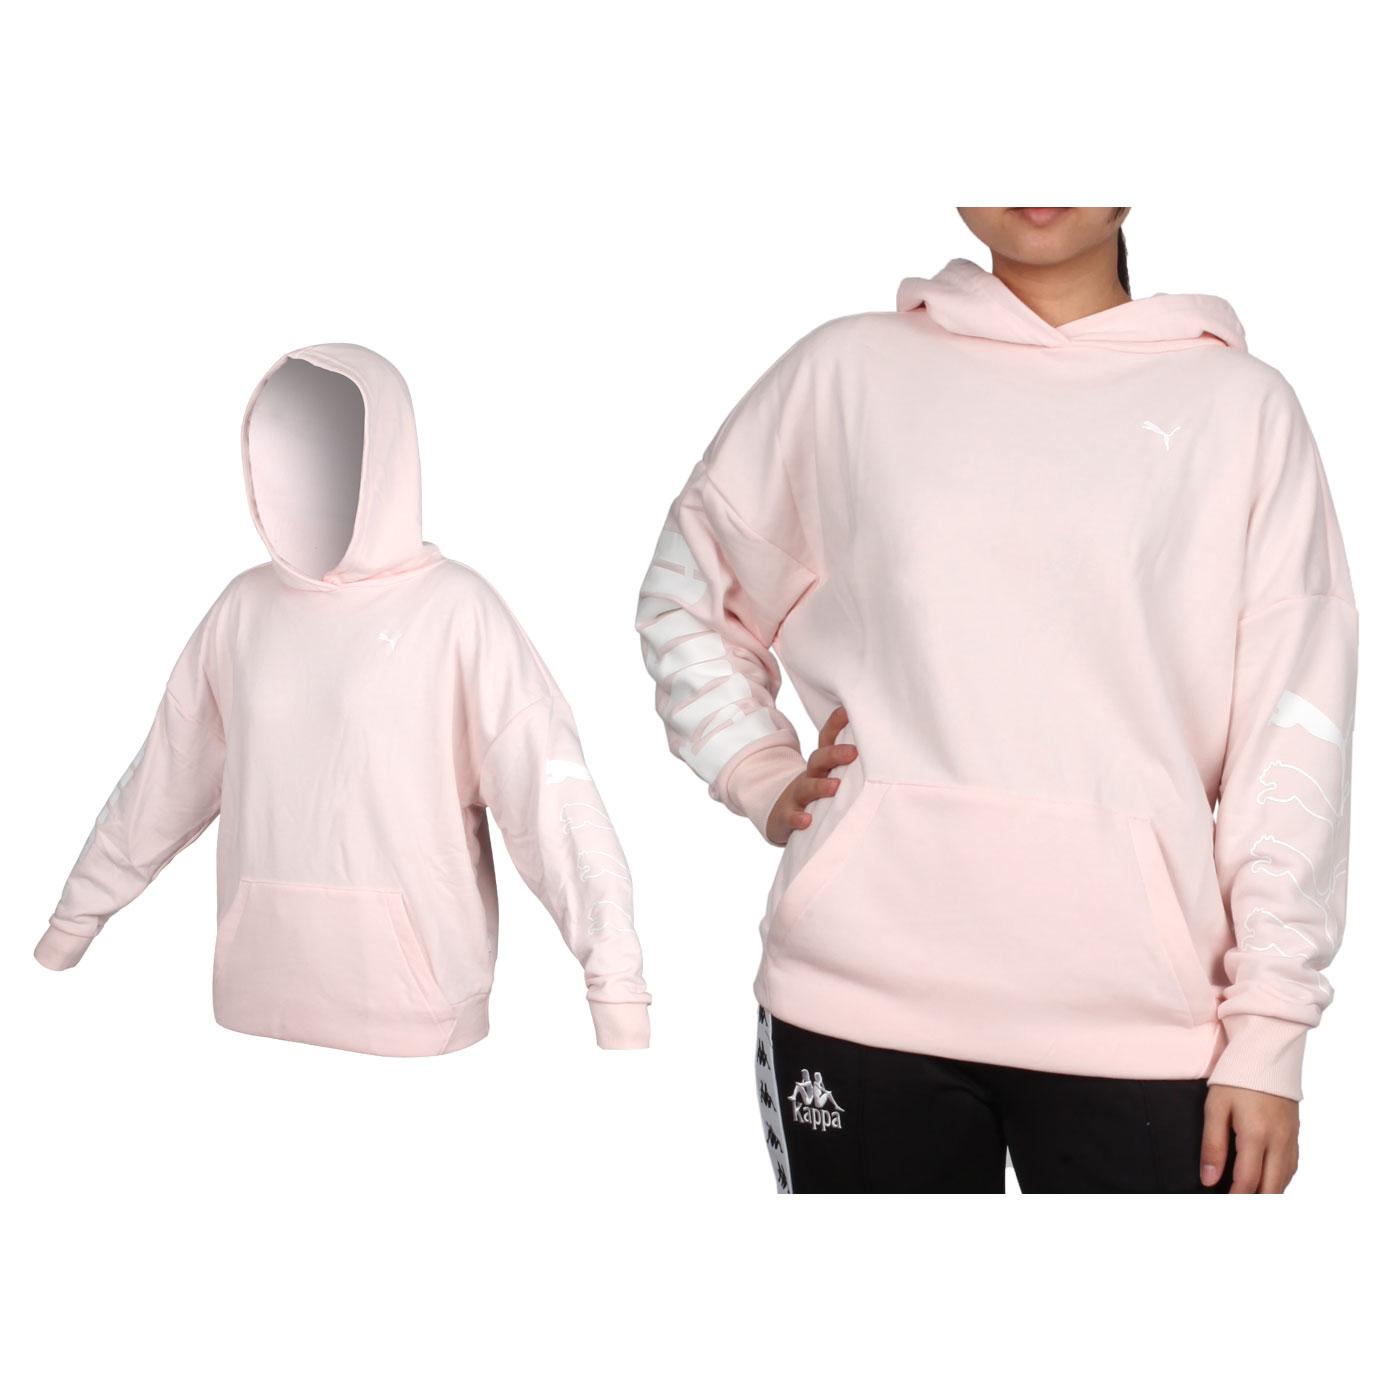 PUMA 女款基本系列長厚連帽T恤 58282117 - 淺粉白